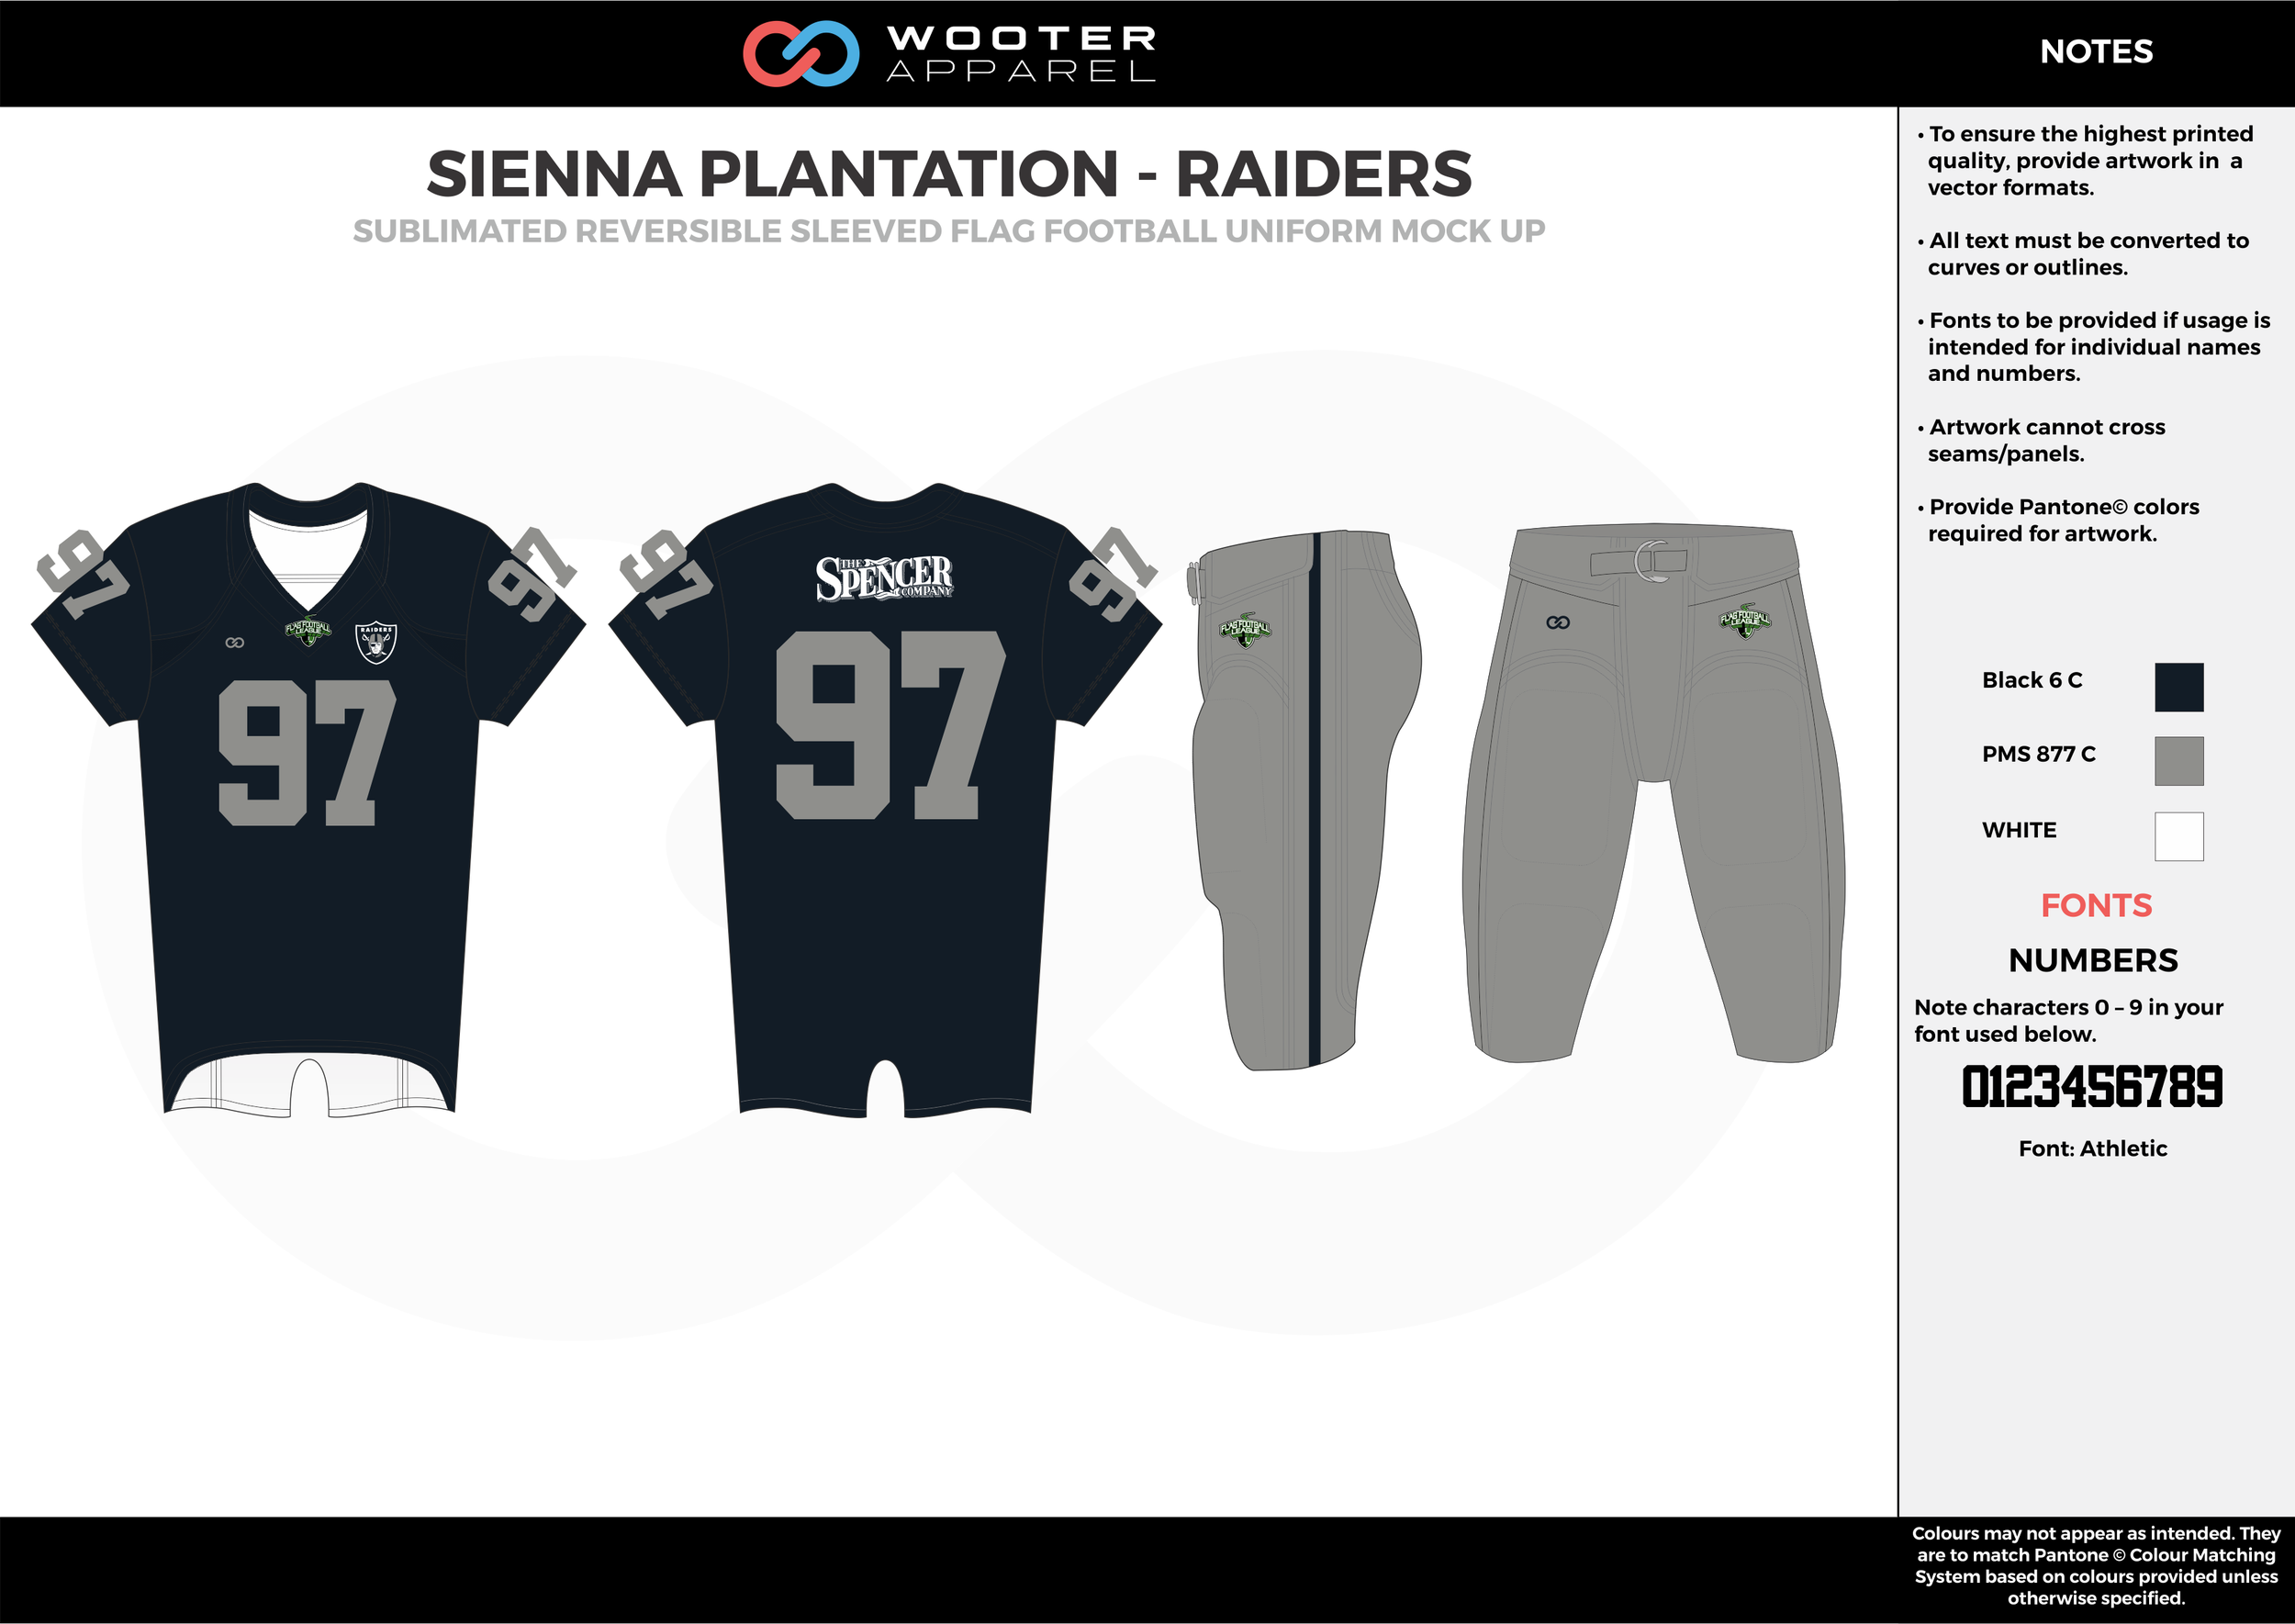 SIENNA PLANTATION - RAIDERS black gray white Football Uniform, Jersey, Pants, Integraded